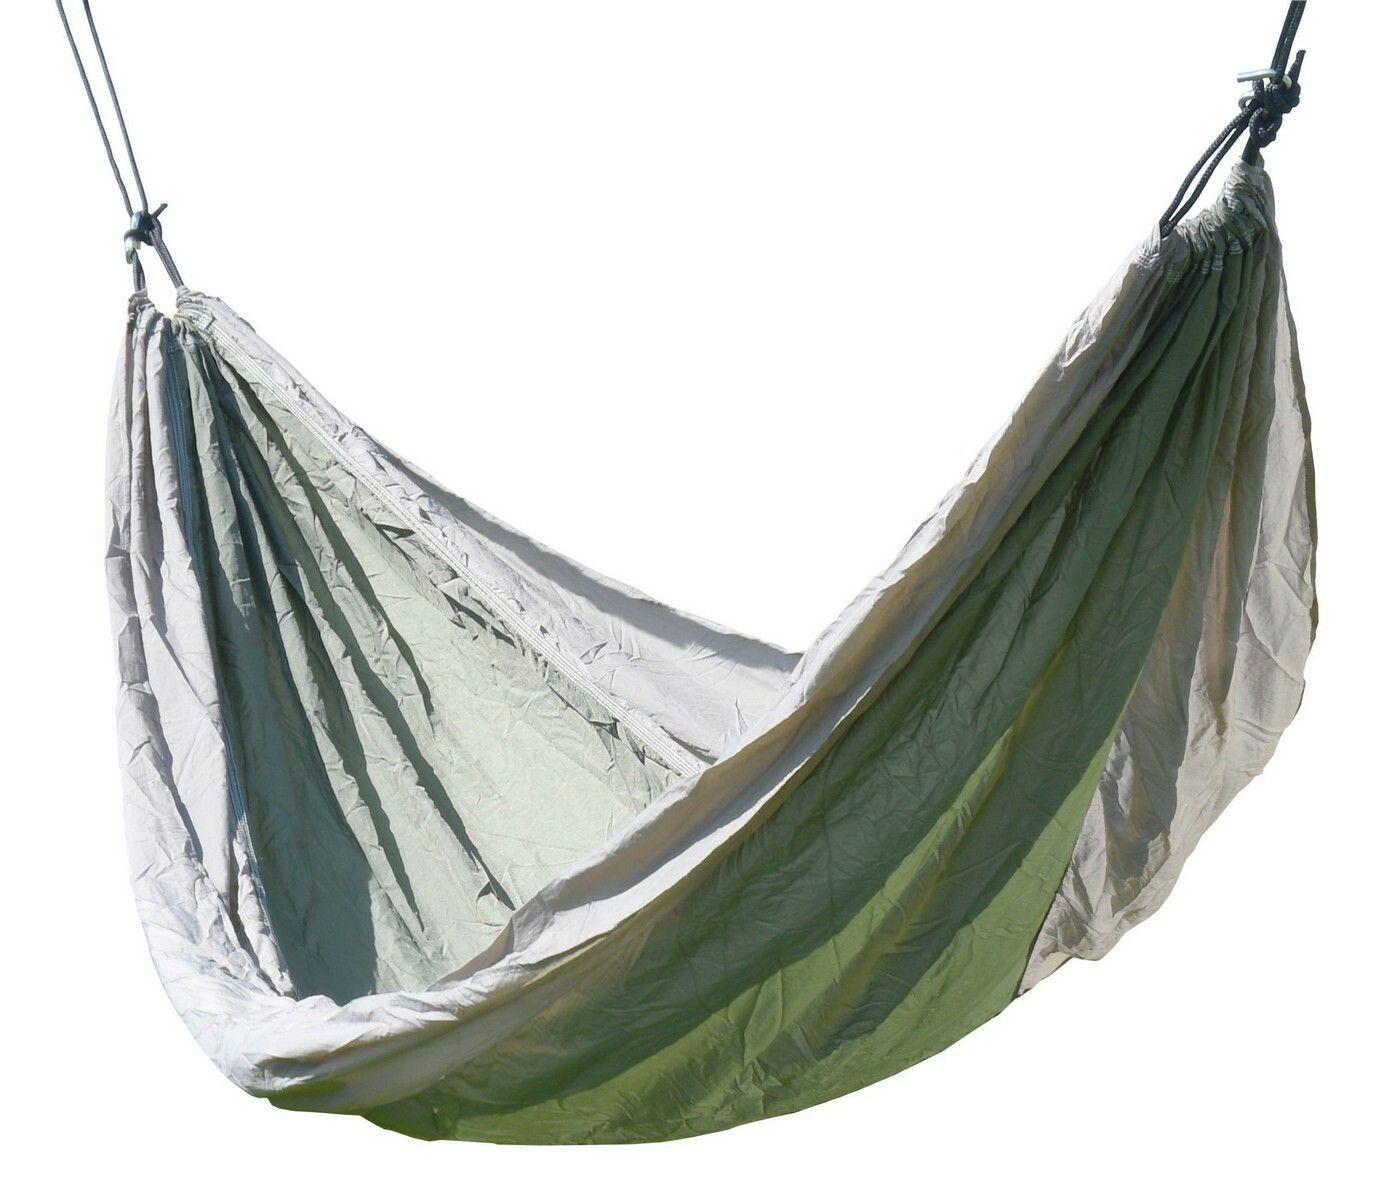 Houpací síť NYLON 275x137cm zeleno-hnědá, CATTARA